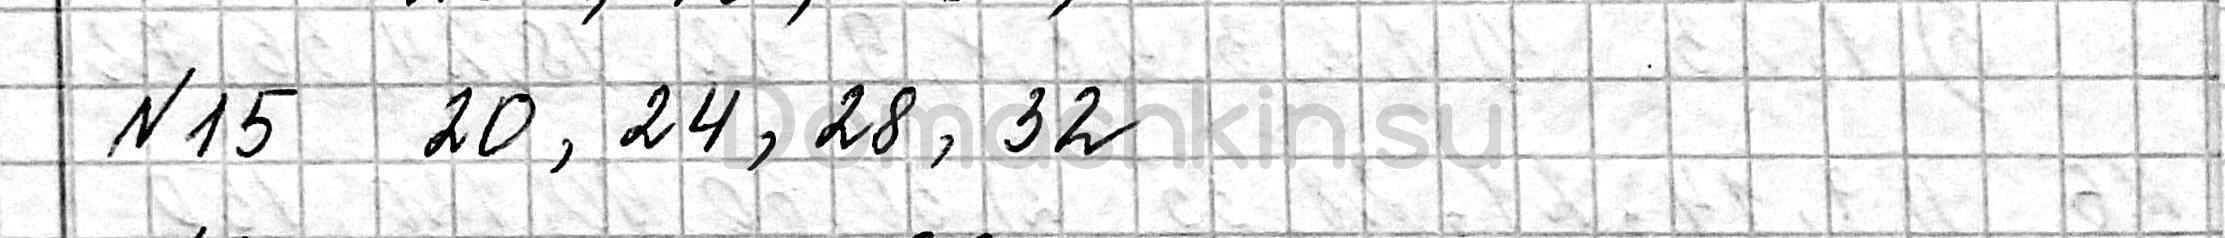 Математика 6 класс учебник Мерзляк номер 15 решение